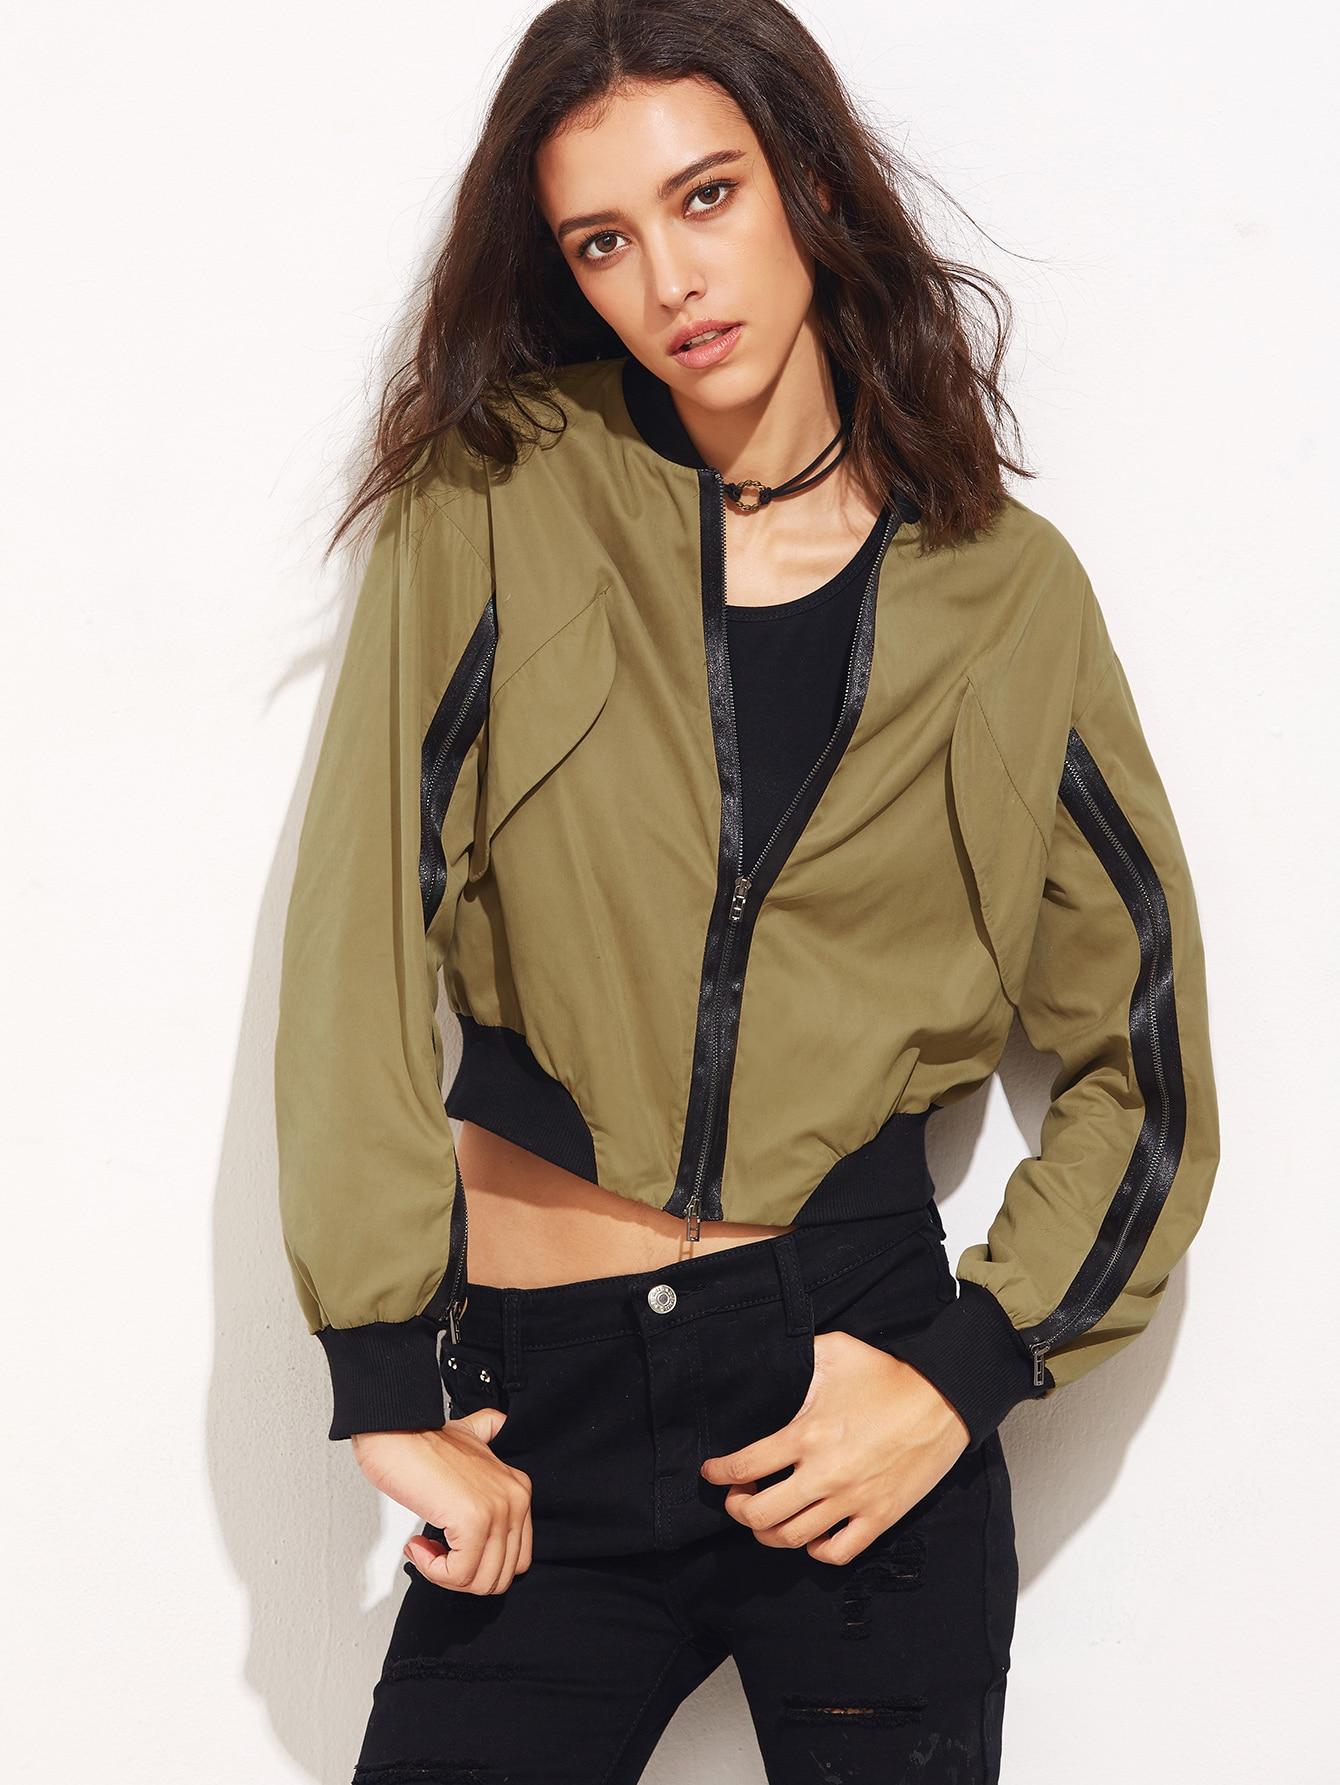 Khaki Contrast Ribbed Trim Bomber Jacket With Zip Detail jacket160913701